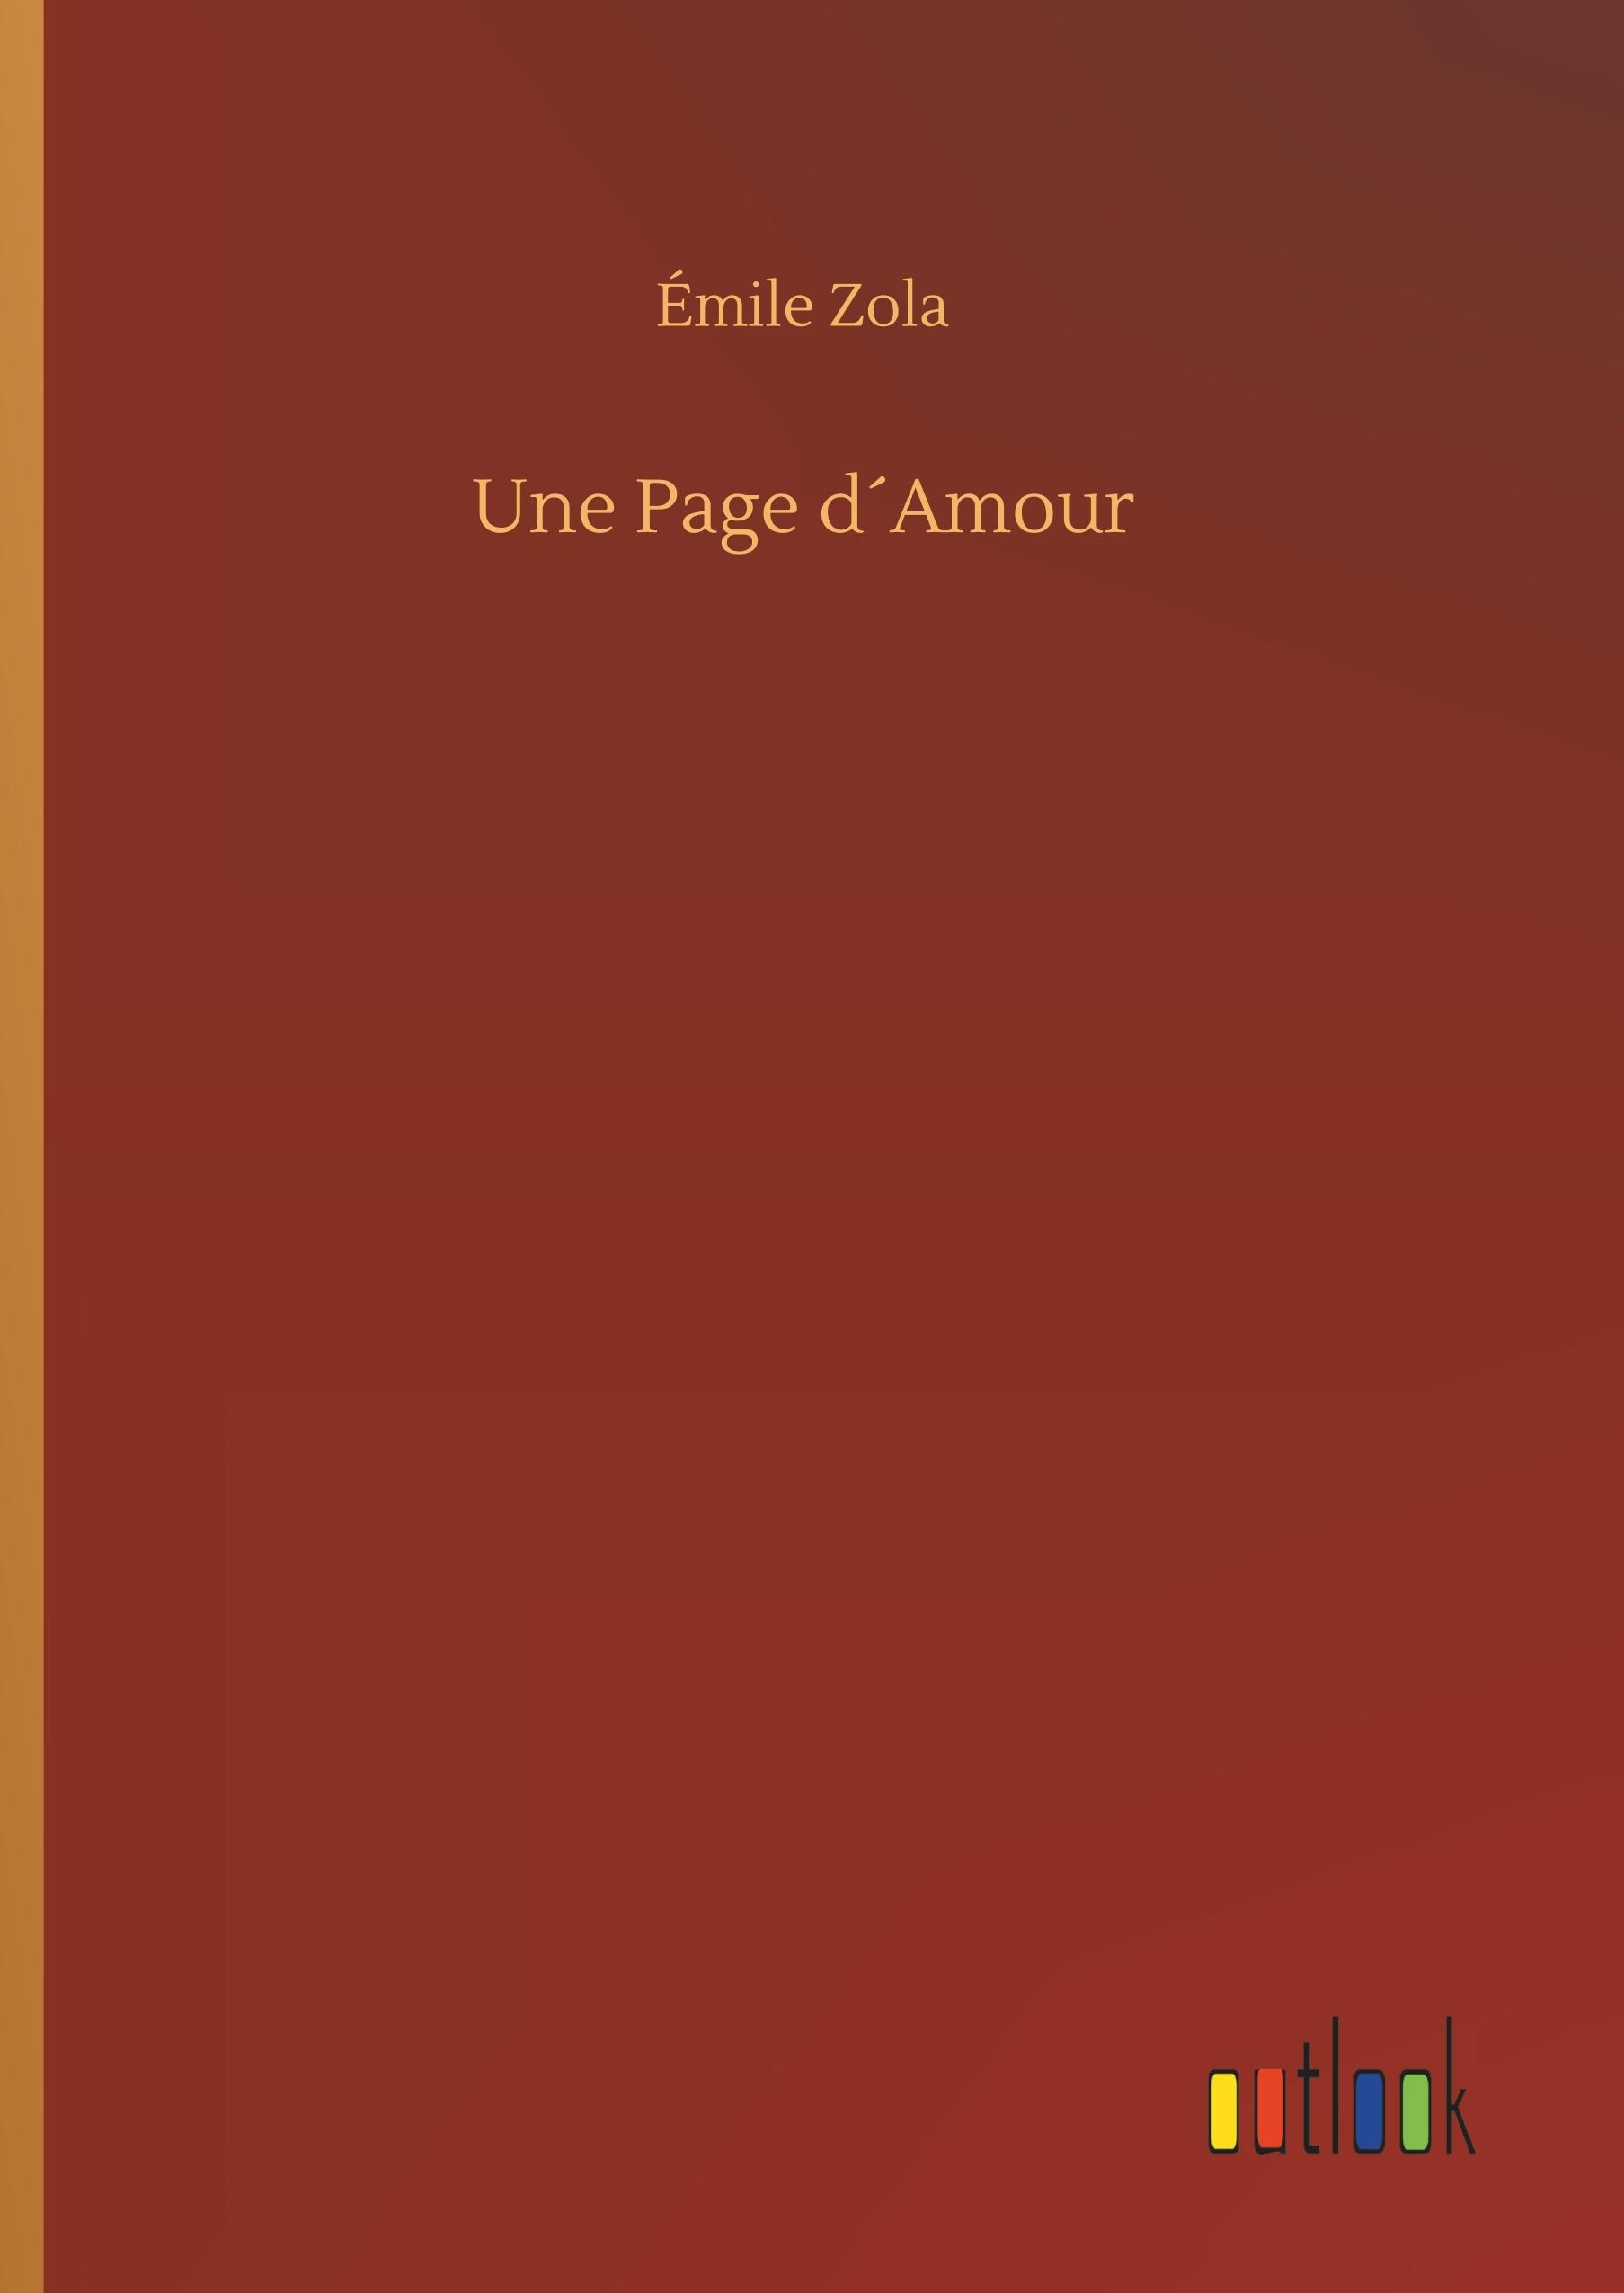 UNE PAGE D AMOUR